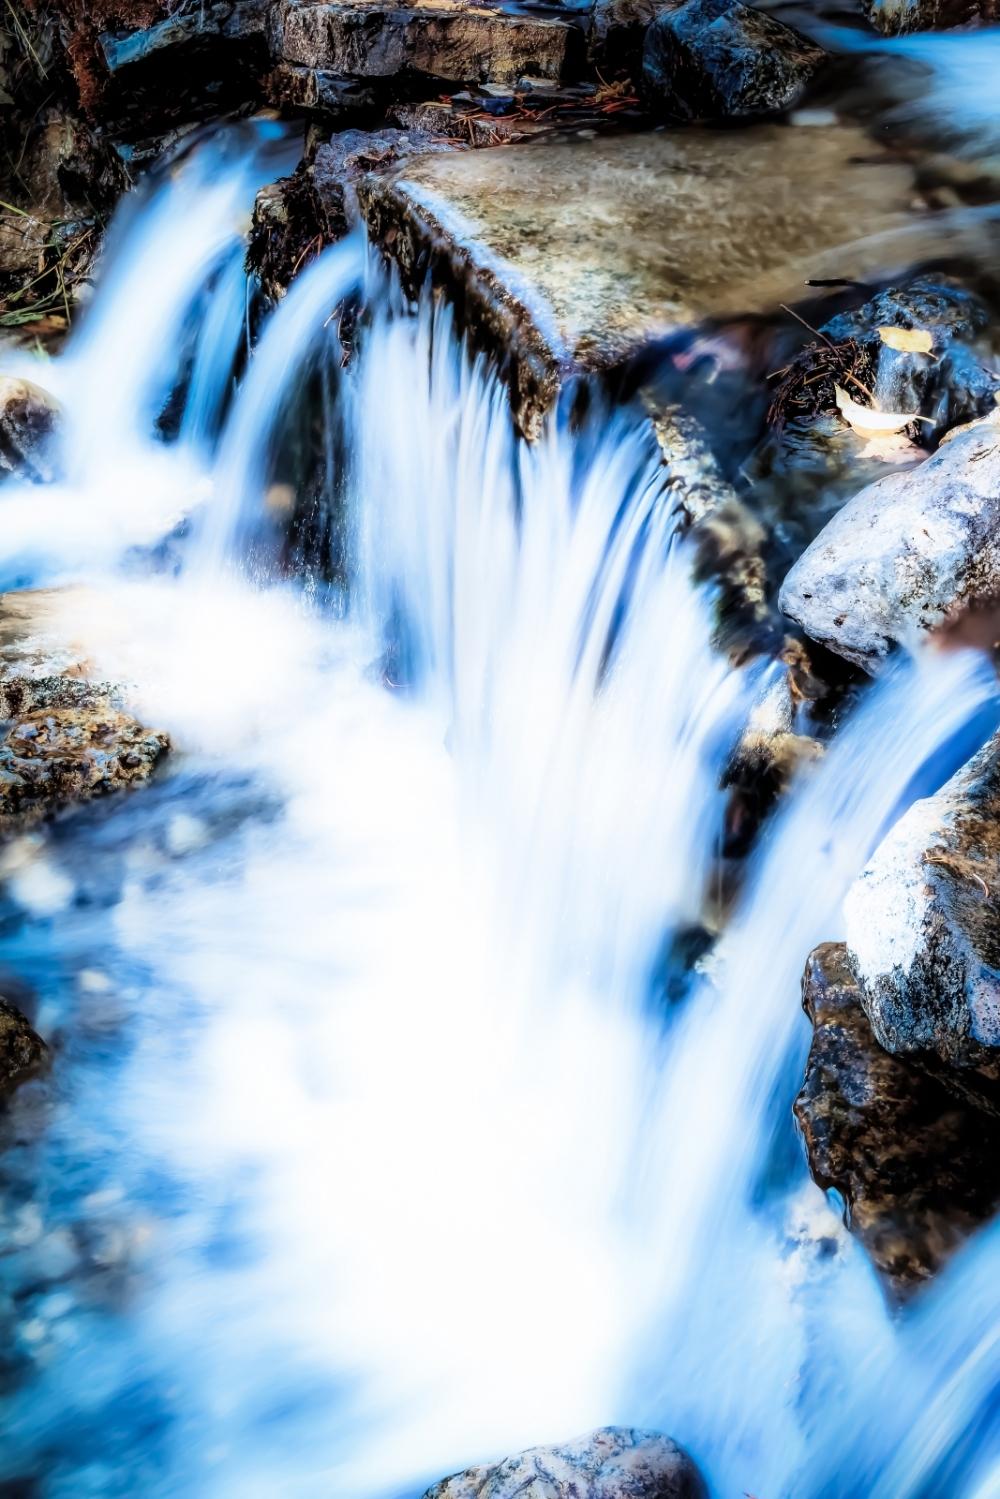 Water Lens - Kananaskis, Alberta 4